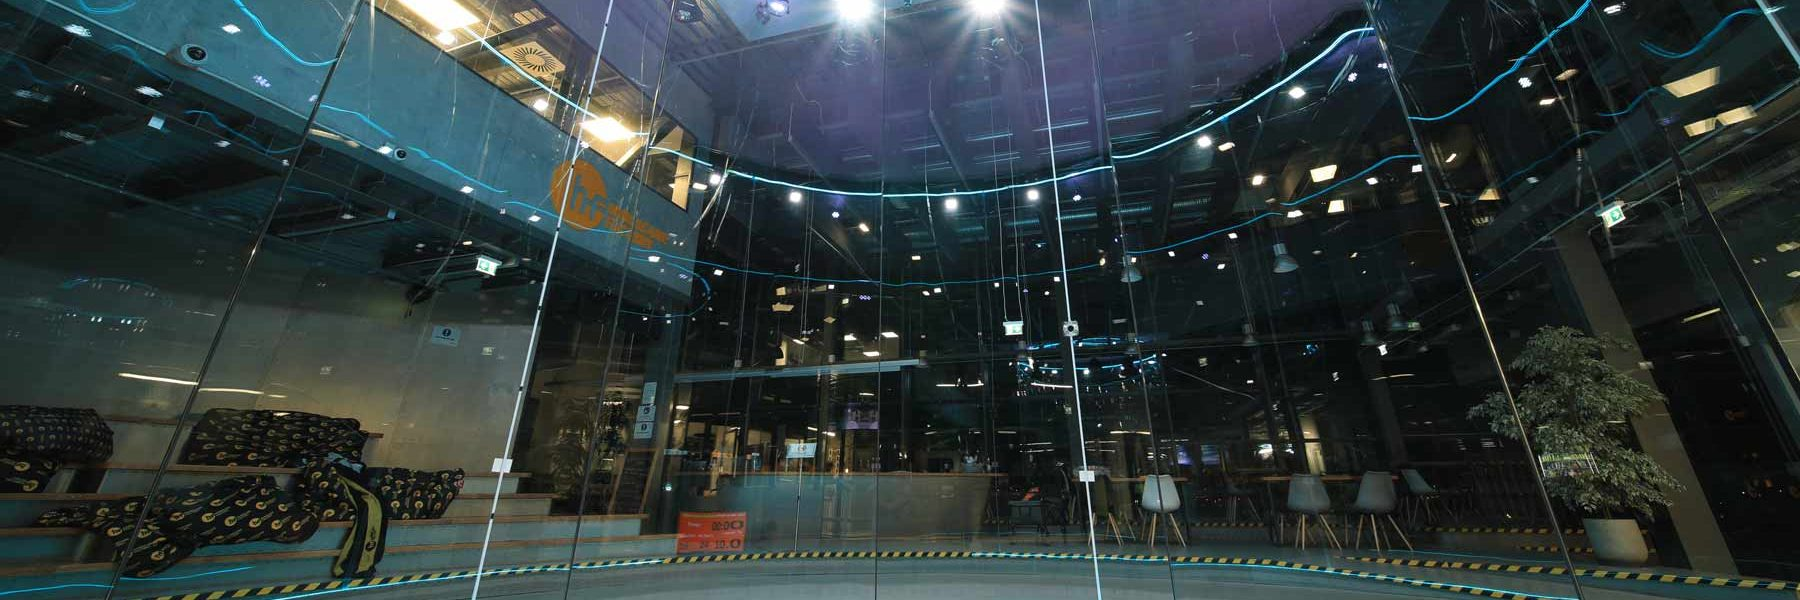 Hurrican Factory Berlin Wind Tunnel